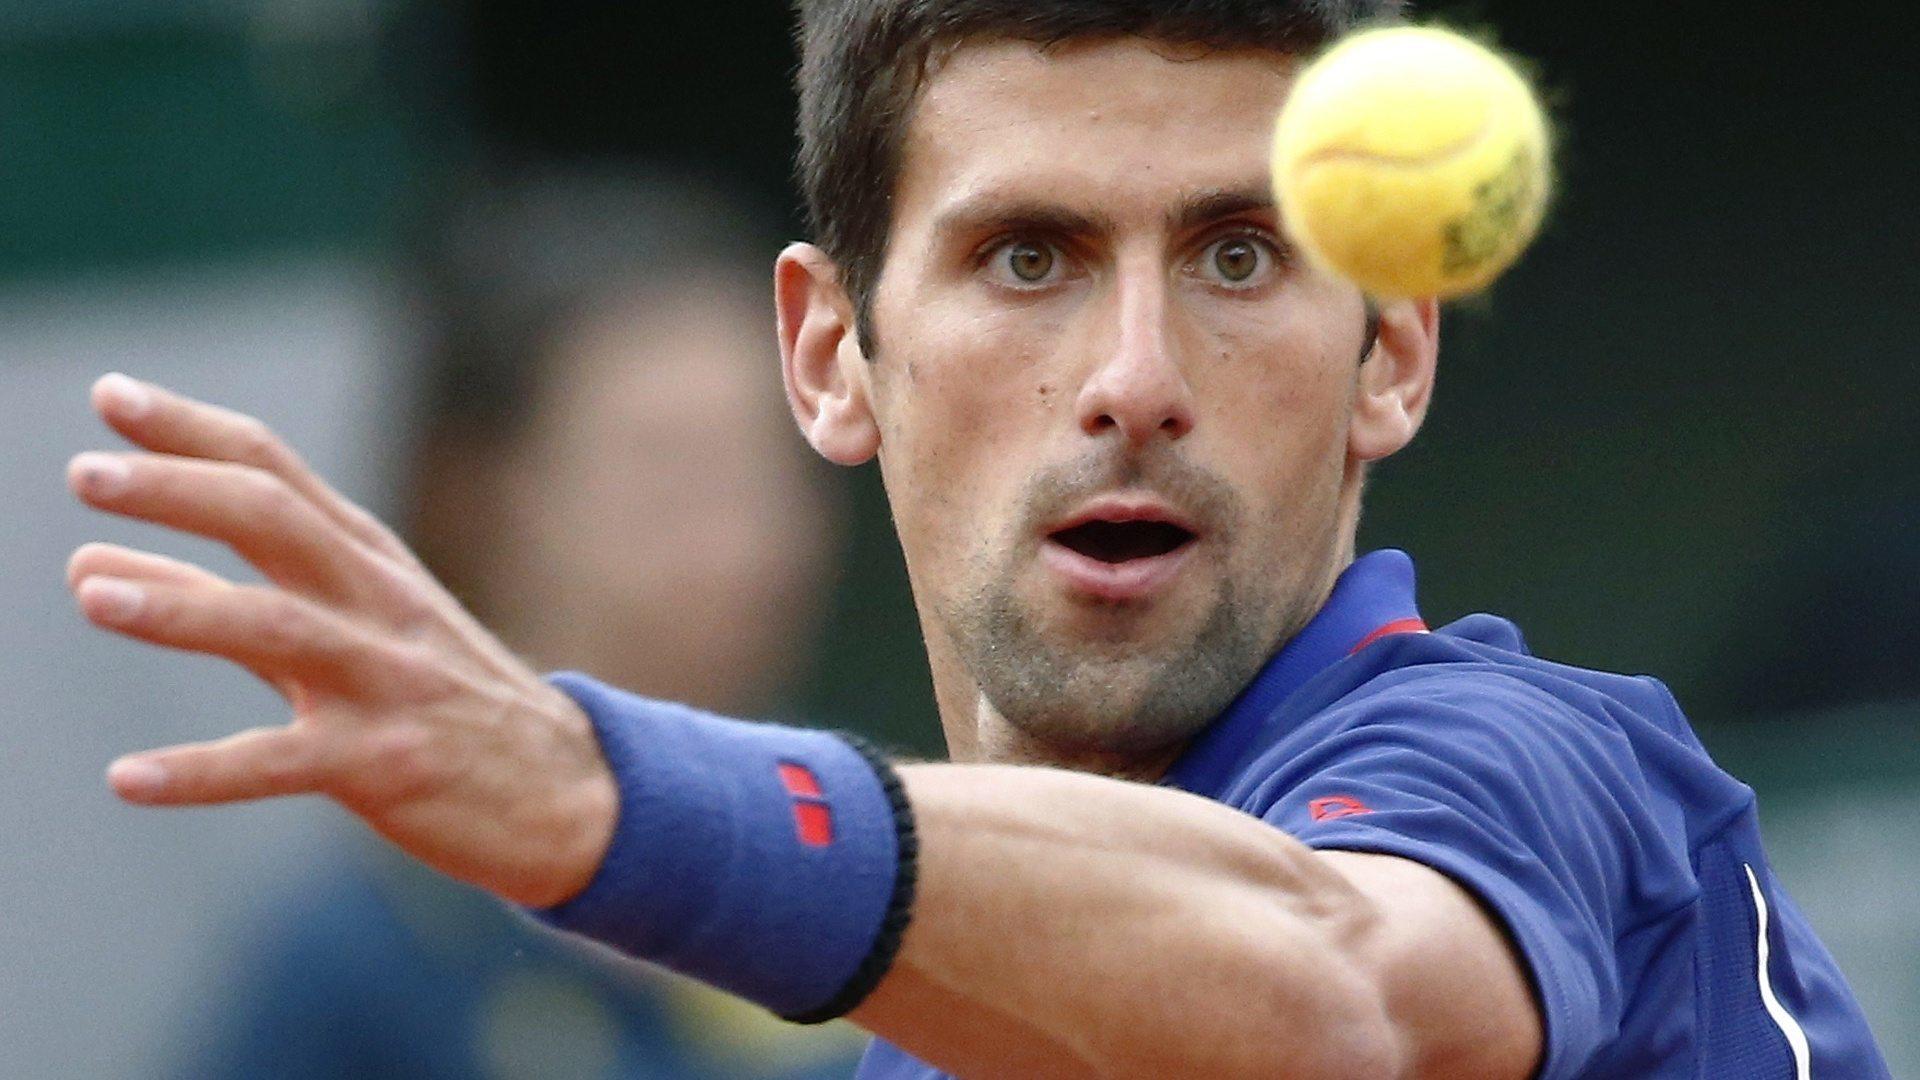 novak djokovic eye on the ball for 2015 rome masters open